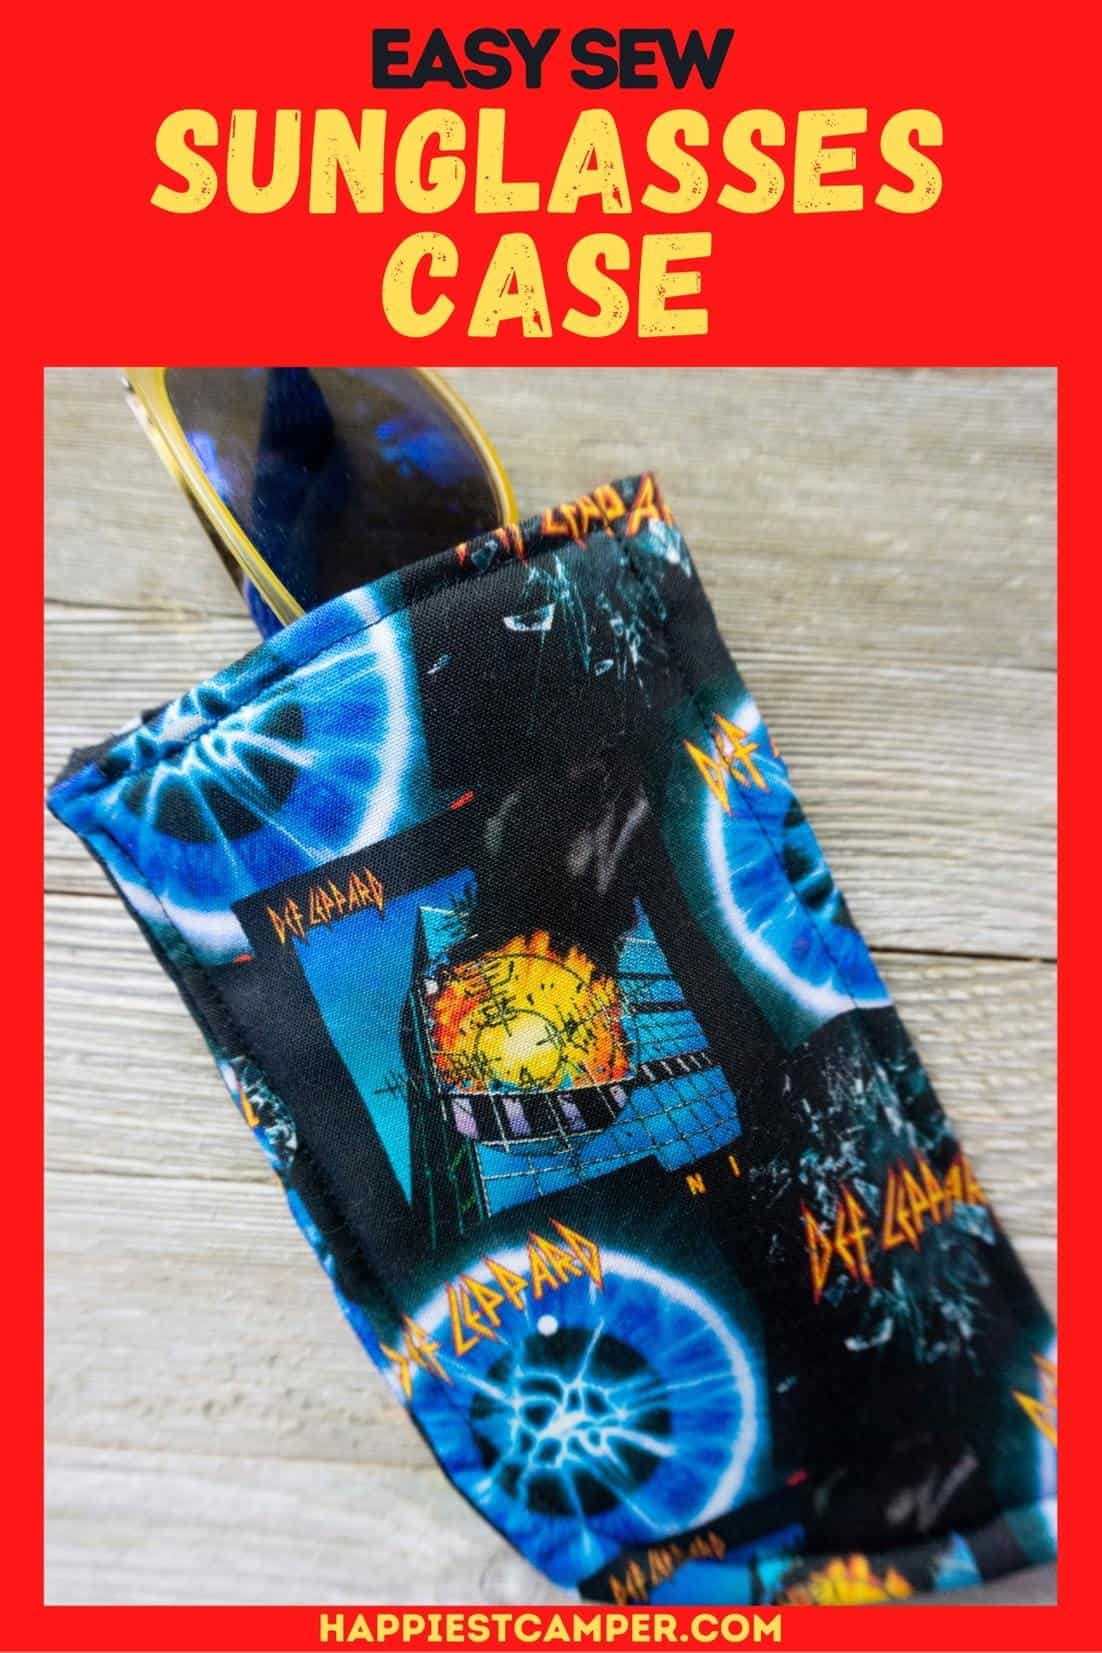 Easy Sew Sunglasses Case